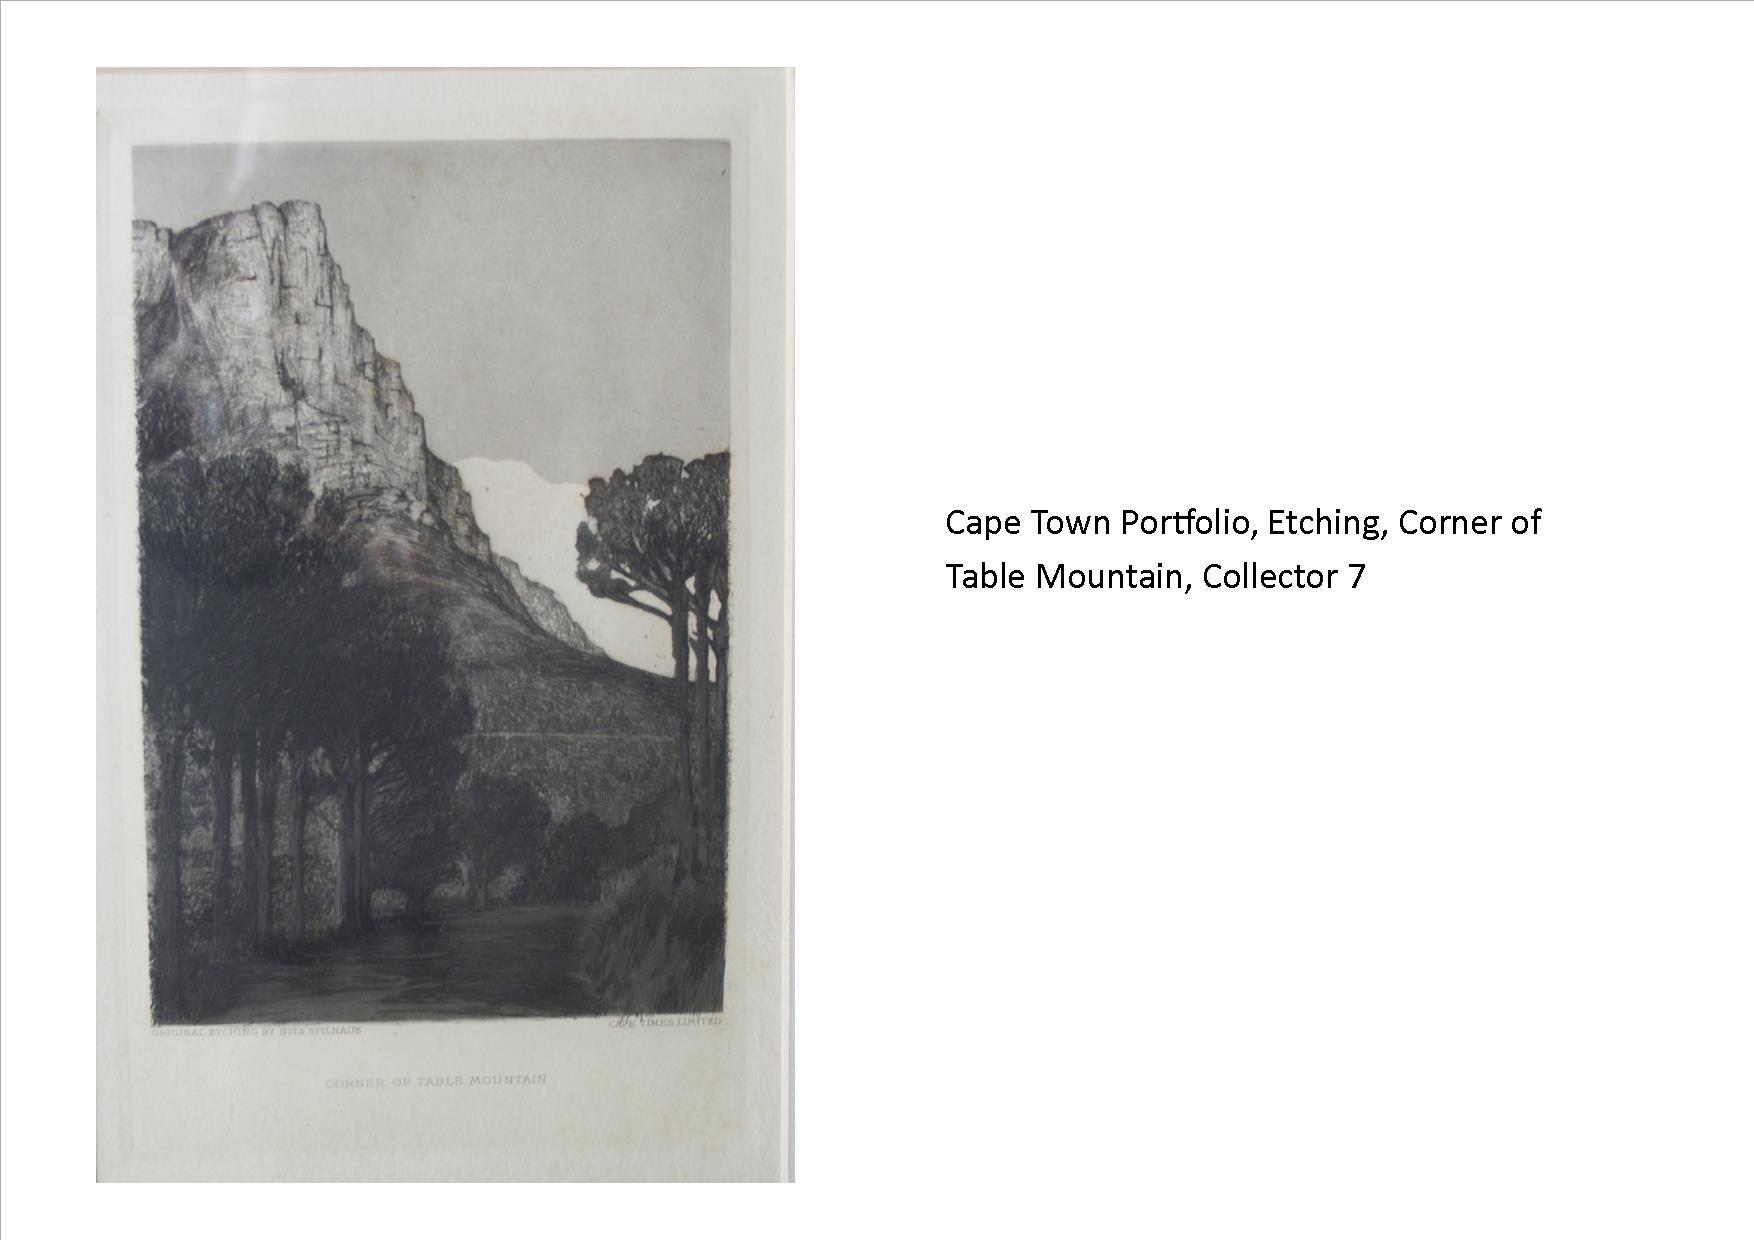 Cnr Table Mountain.jpg